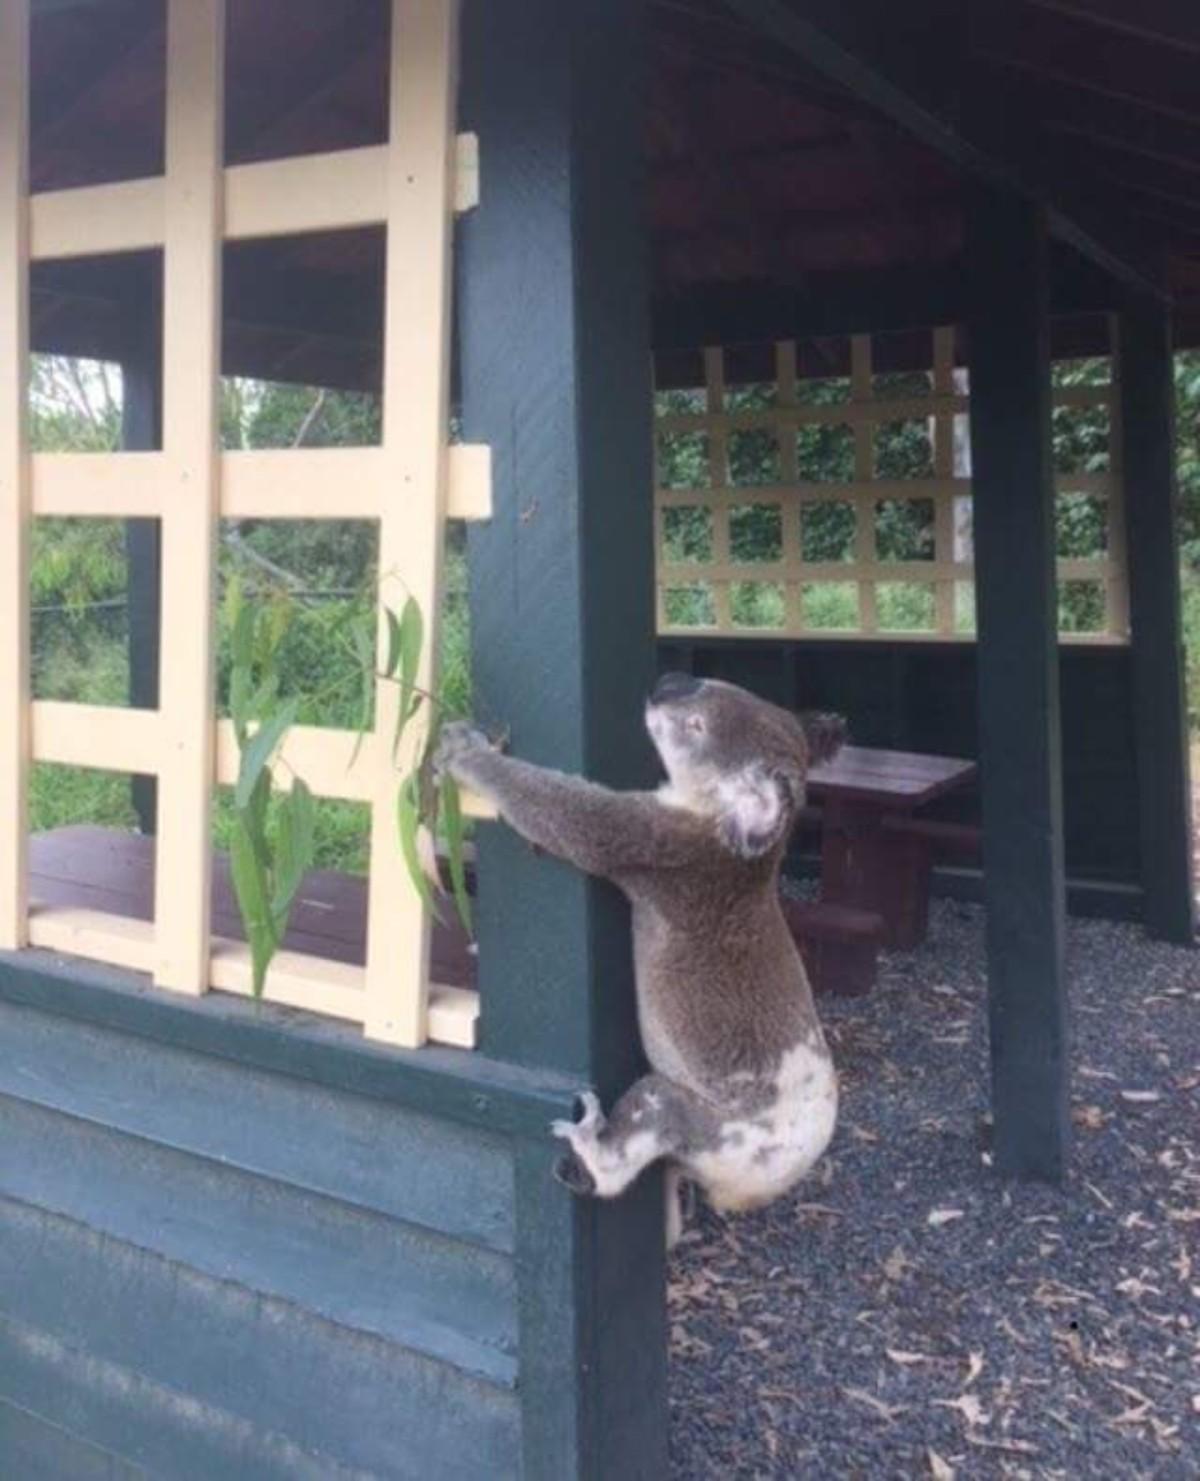 Indignante caso de maltrato animal contra un koala — Australia